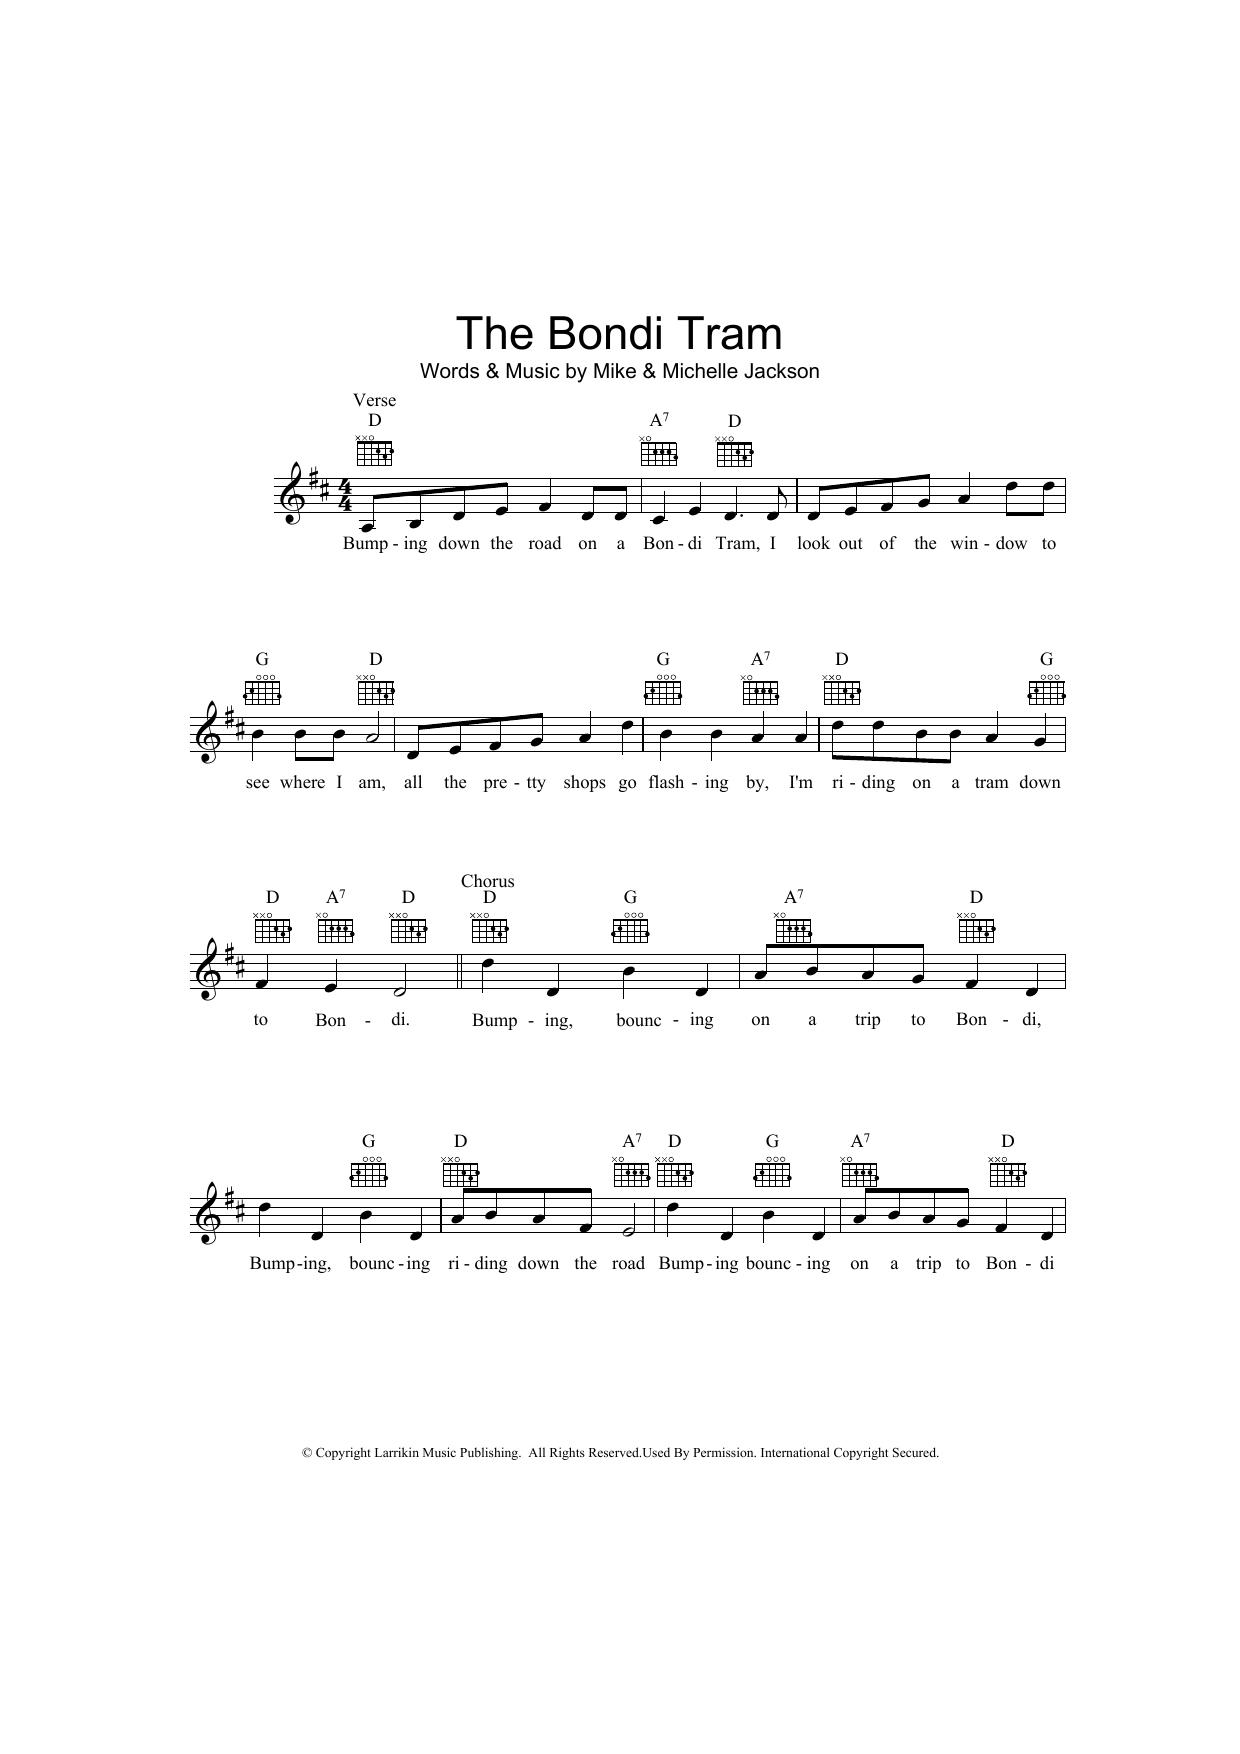 The Bondi Tram Sheet Music